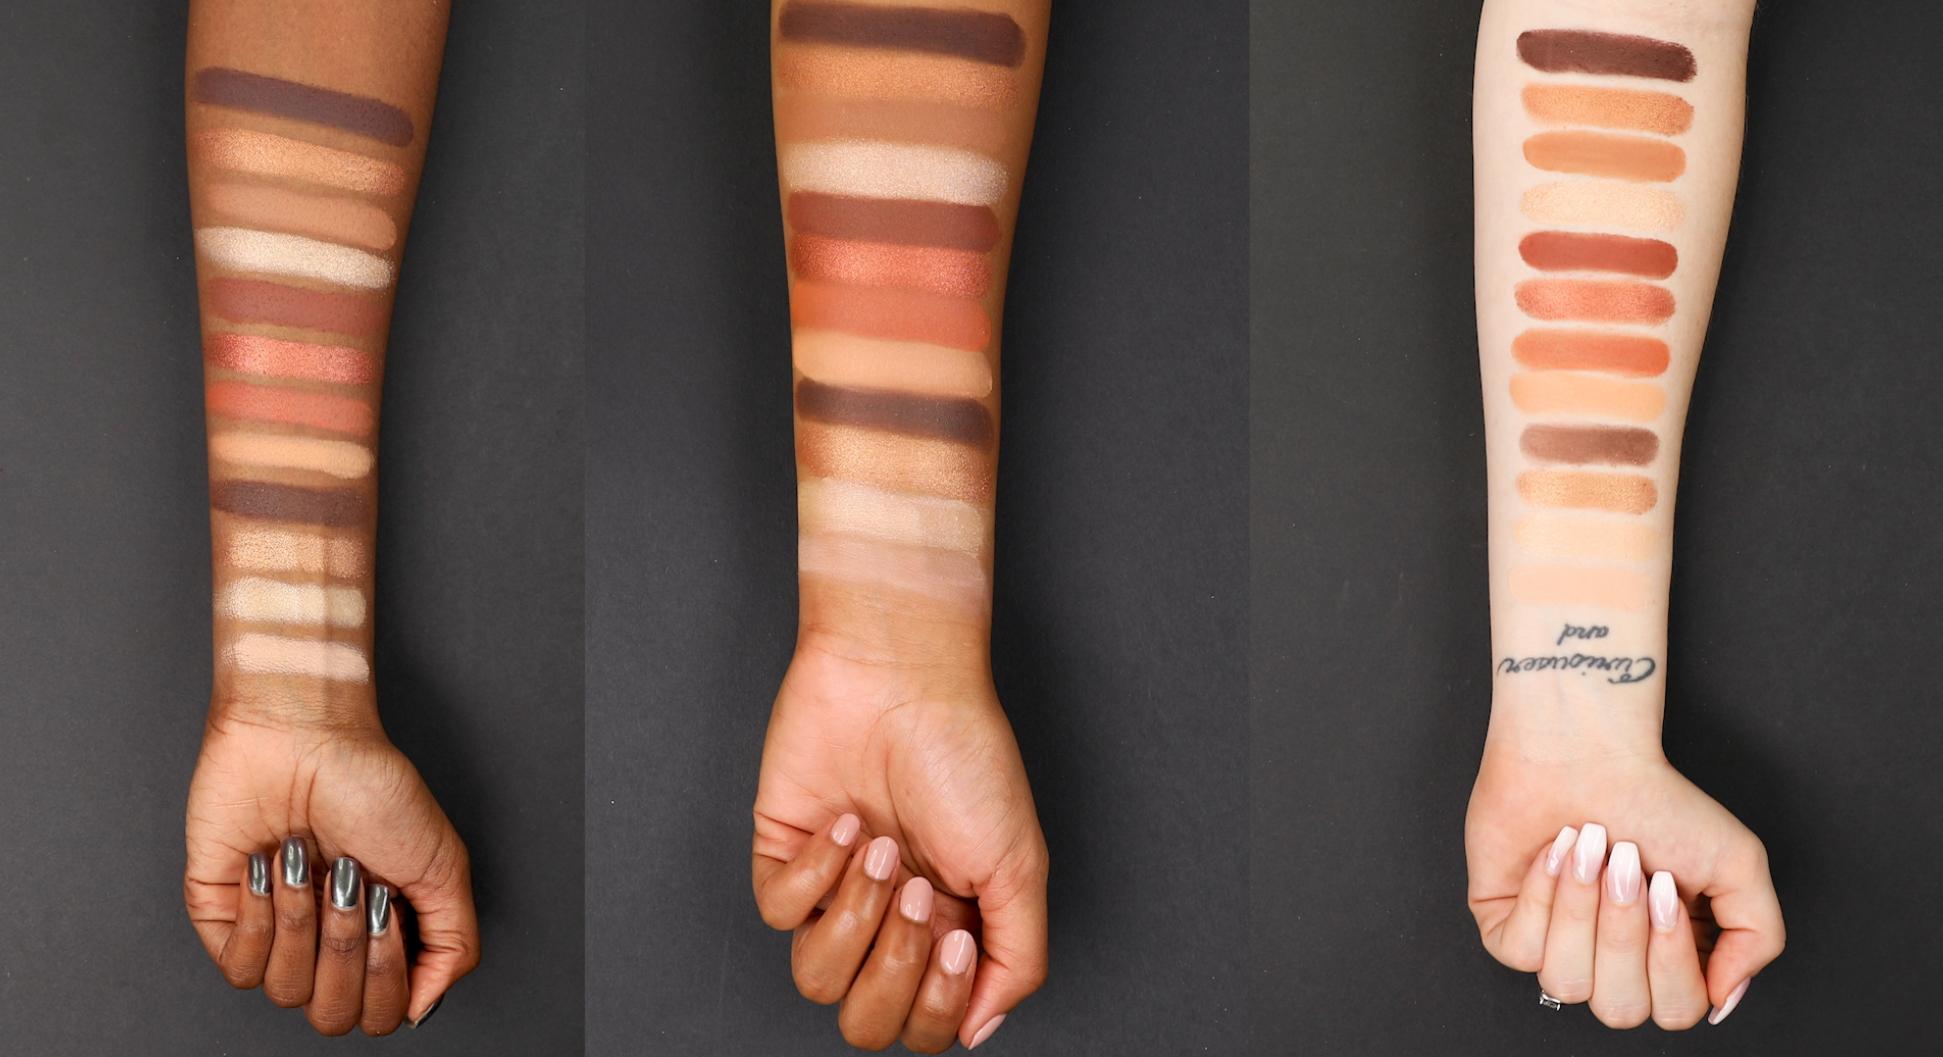 Tartelette Toasted Eyeshadow Palette by Tarte #21